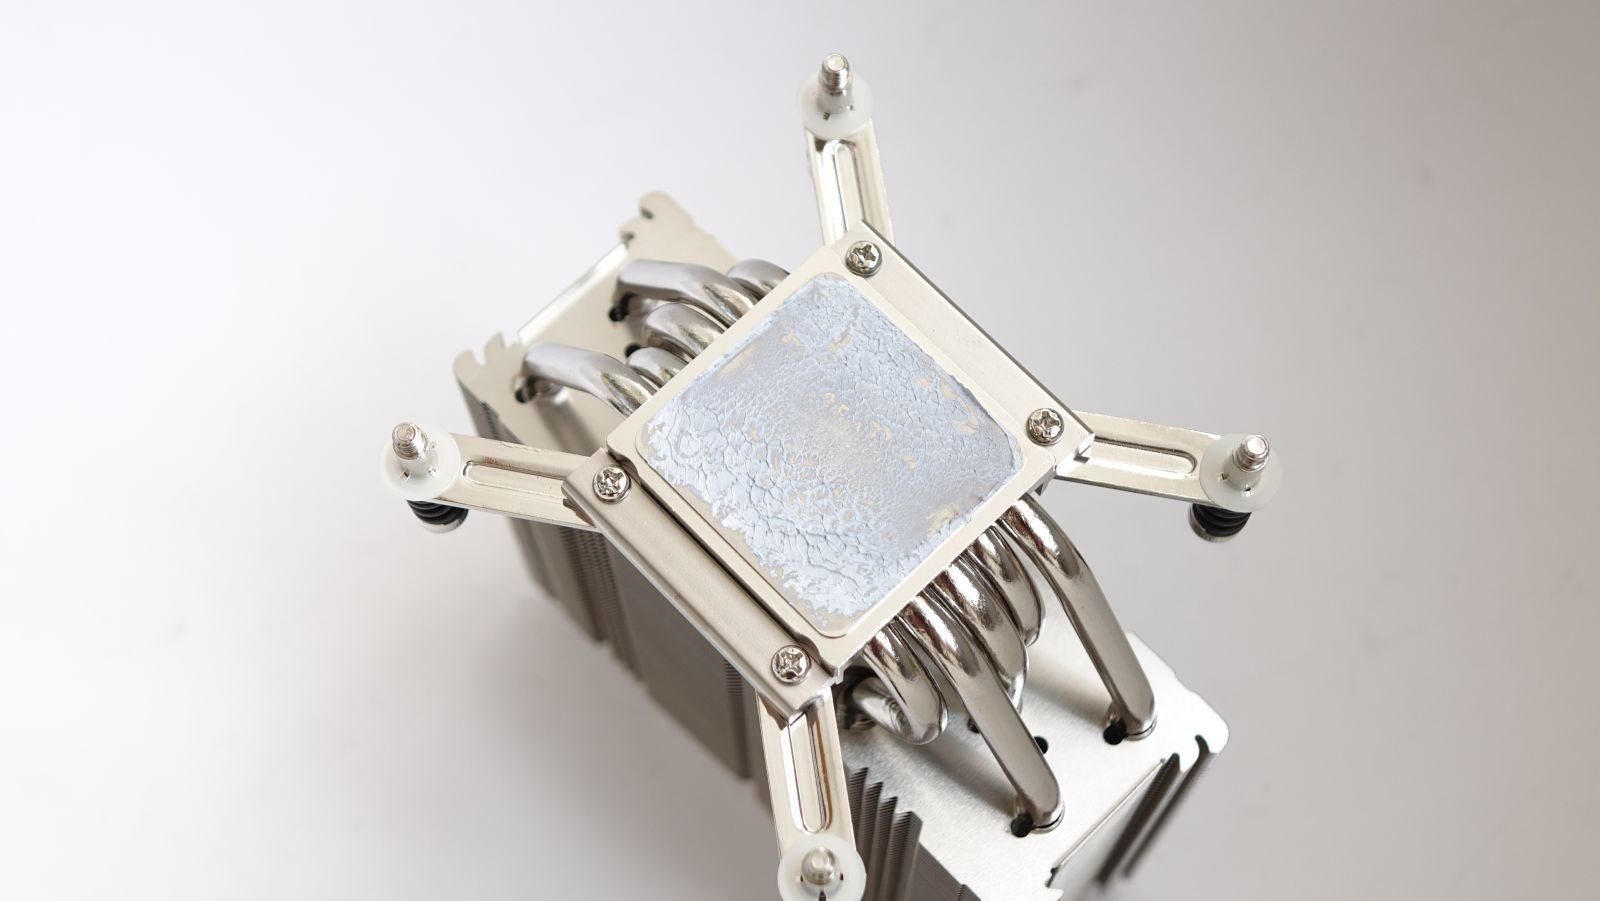 Noctua NH-U12DX i4 отпечаток термопасты